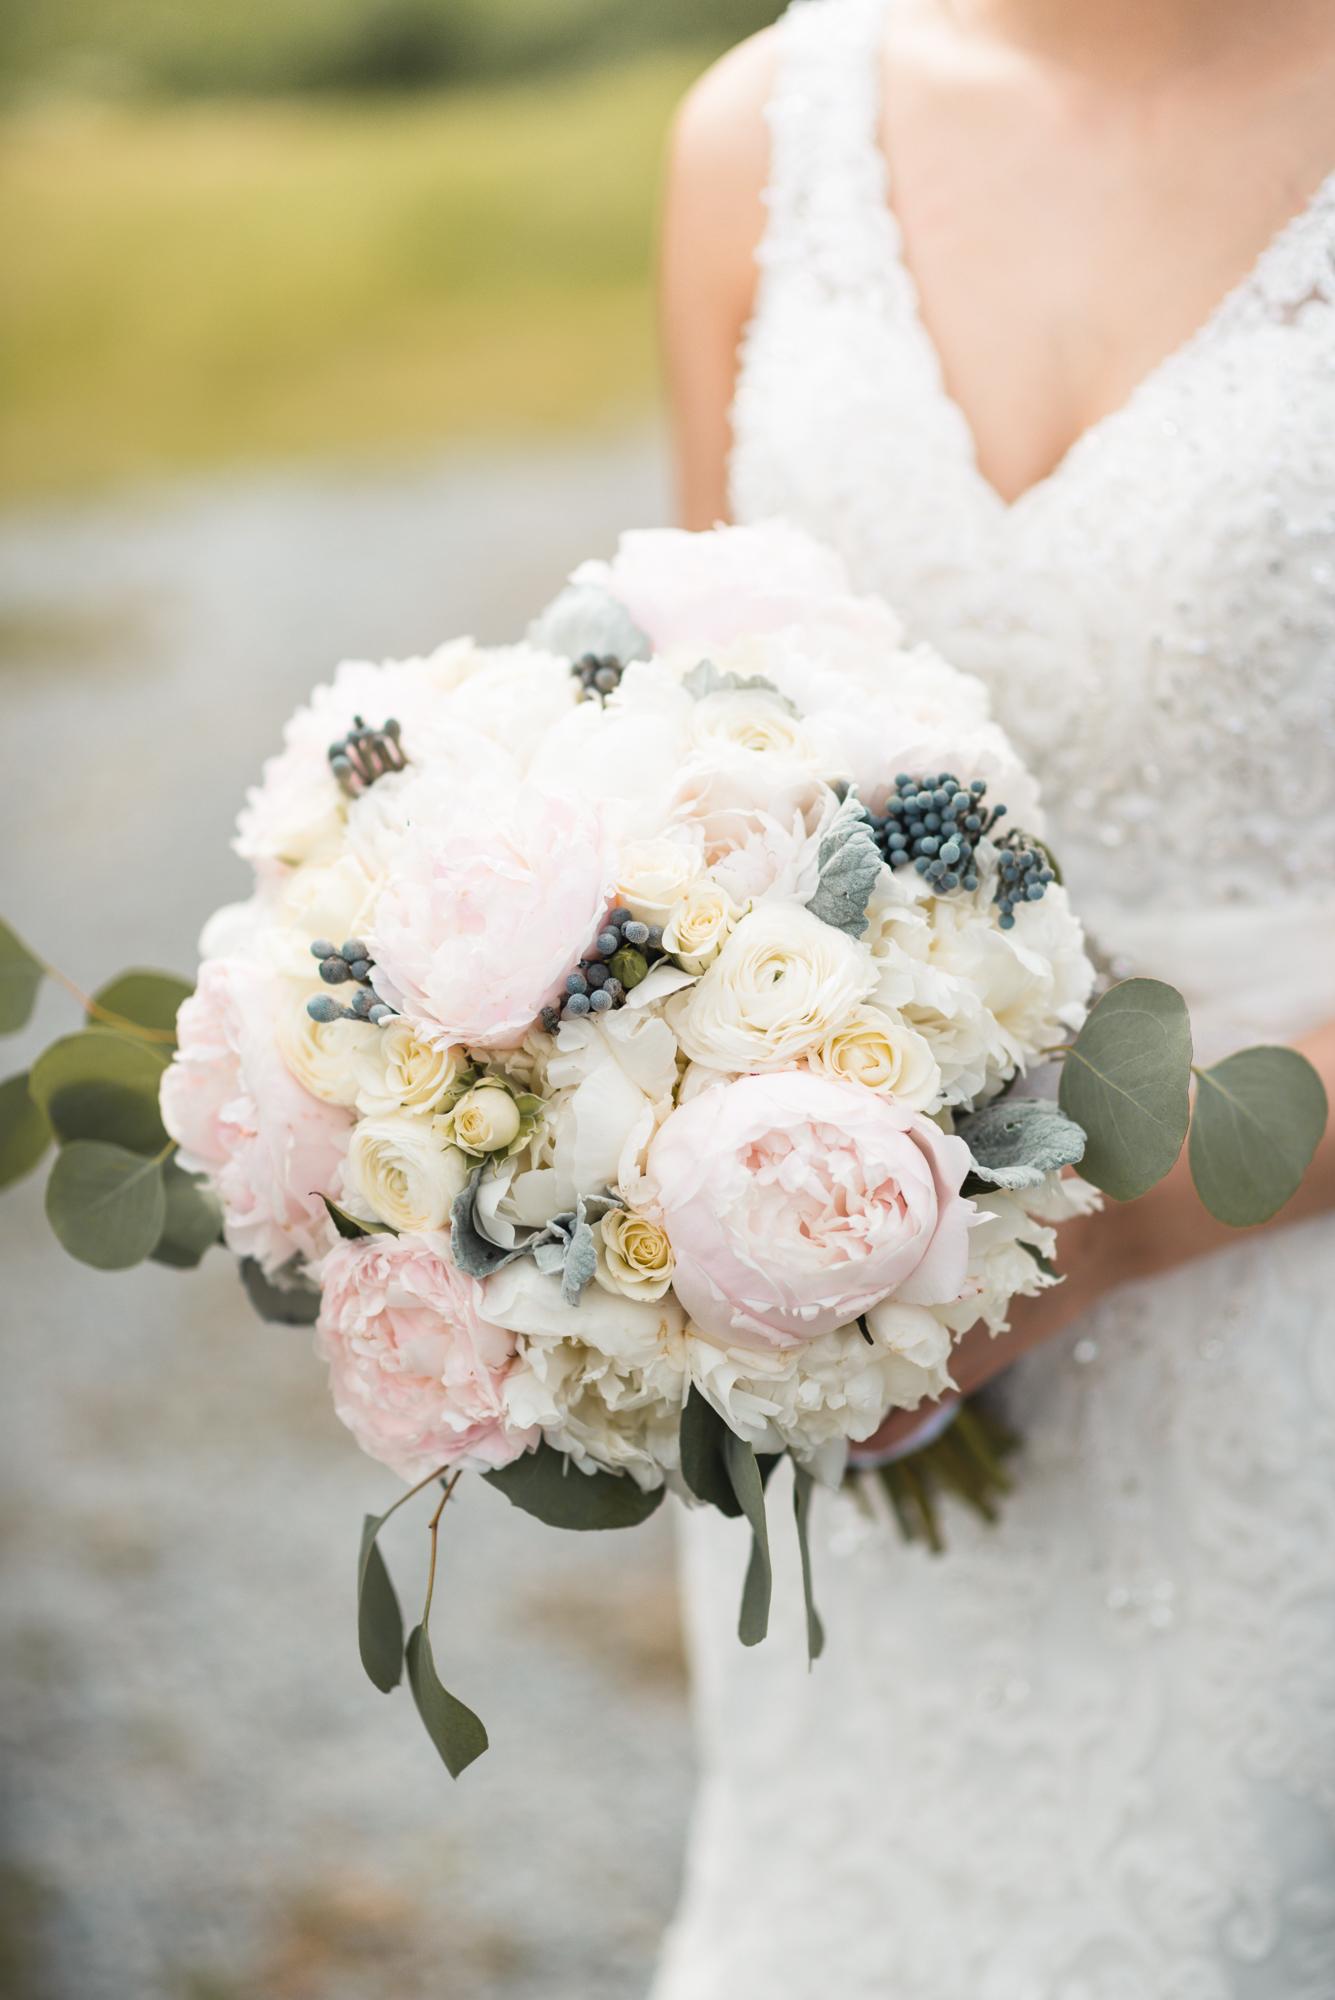 20170610-Wedding_RebeccaAndSunny-29.jpg